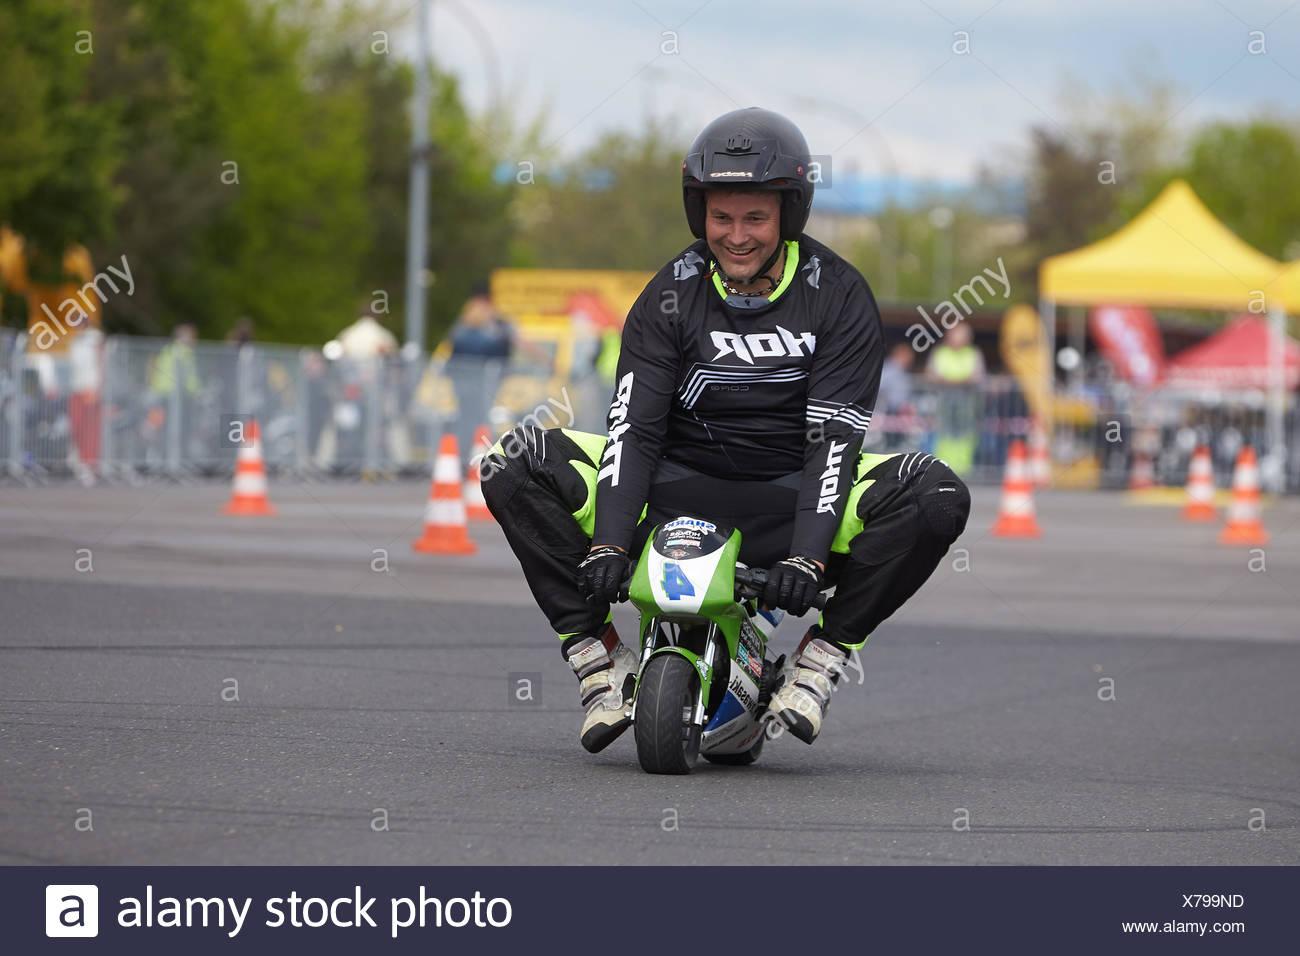 Motorcycle stuntman Mike Auffenberg on a minibike during the ADAC motorbike startup day, Koblenz, Rhineland-Palatinate, Germany - Stock Image